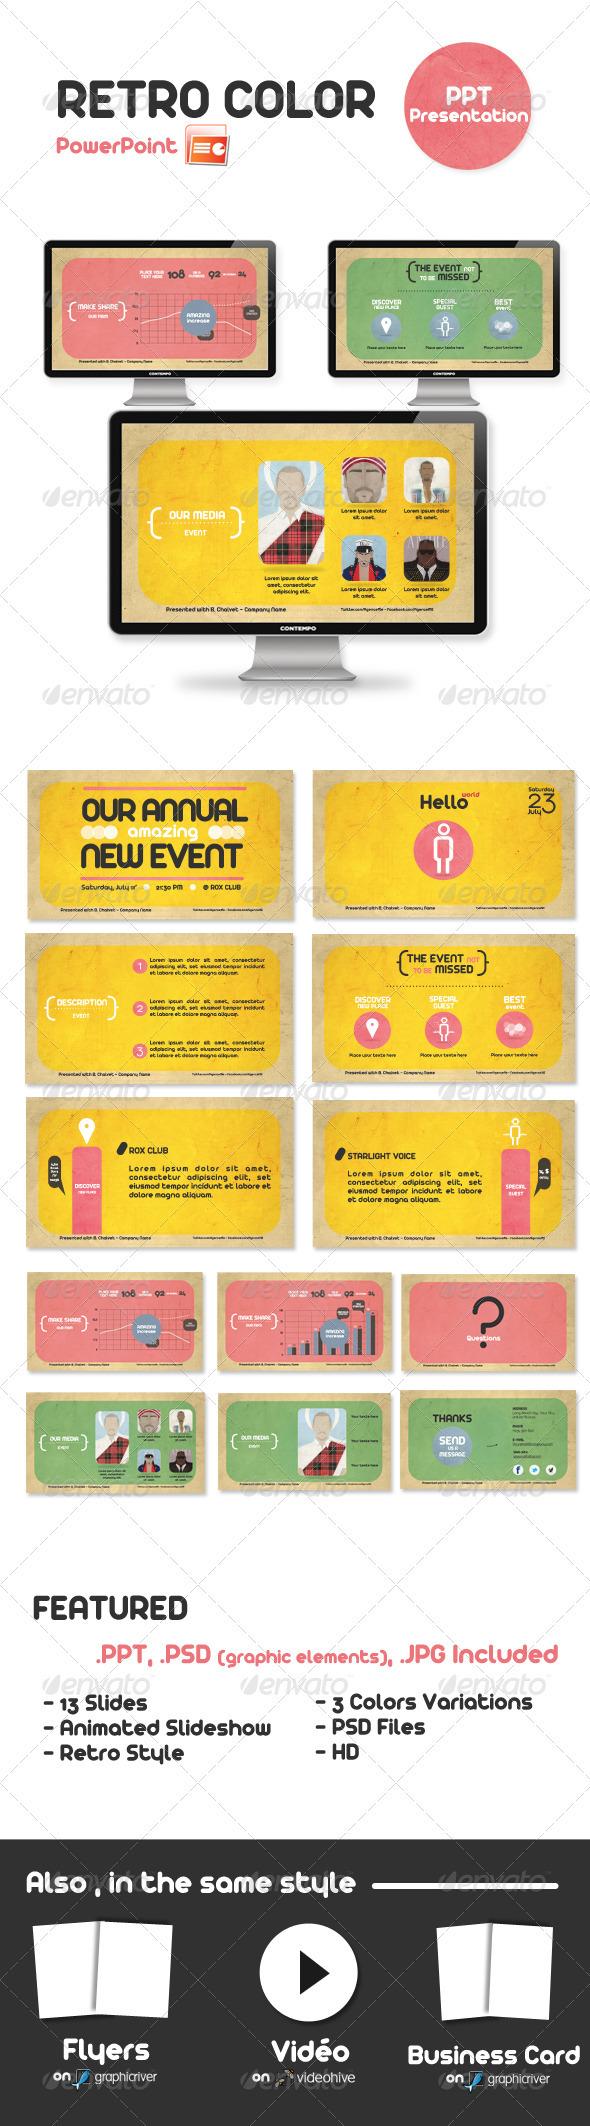 GraphicRiver Retro Color Powerpoint Presentation 340822